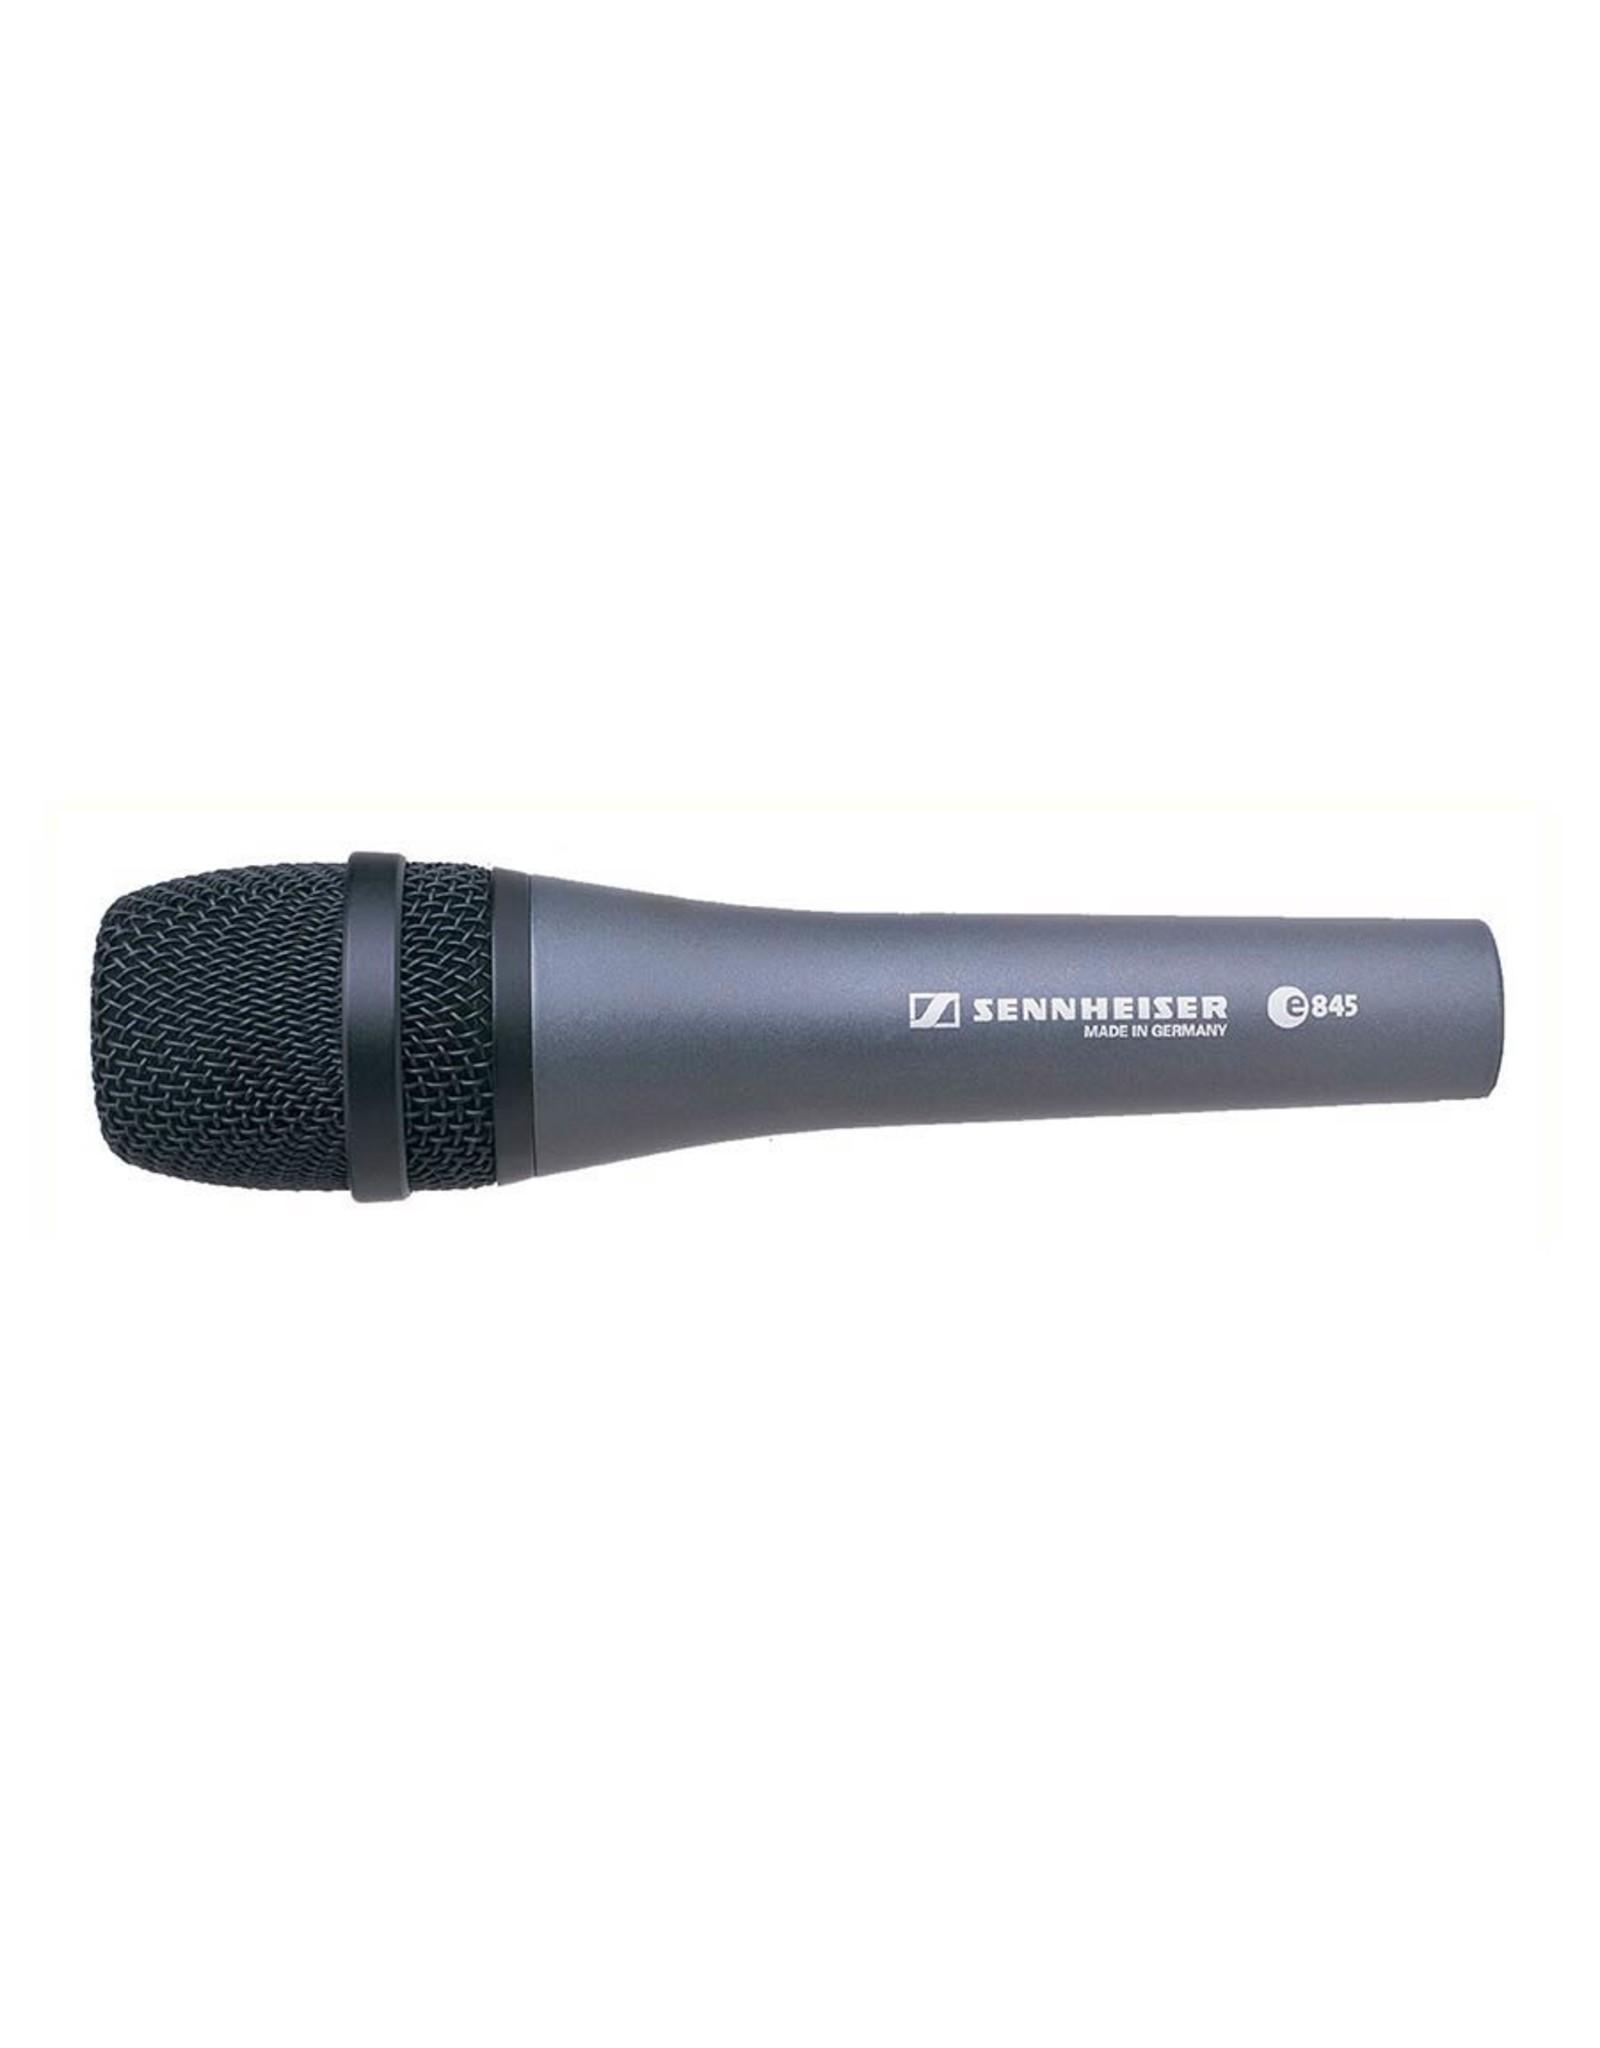 Sennheiser e845| Sennheiser Evolution Series dynamische super-cardioïde zangmicrofoon